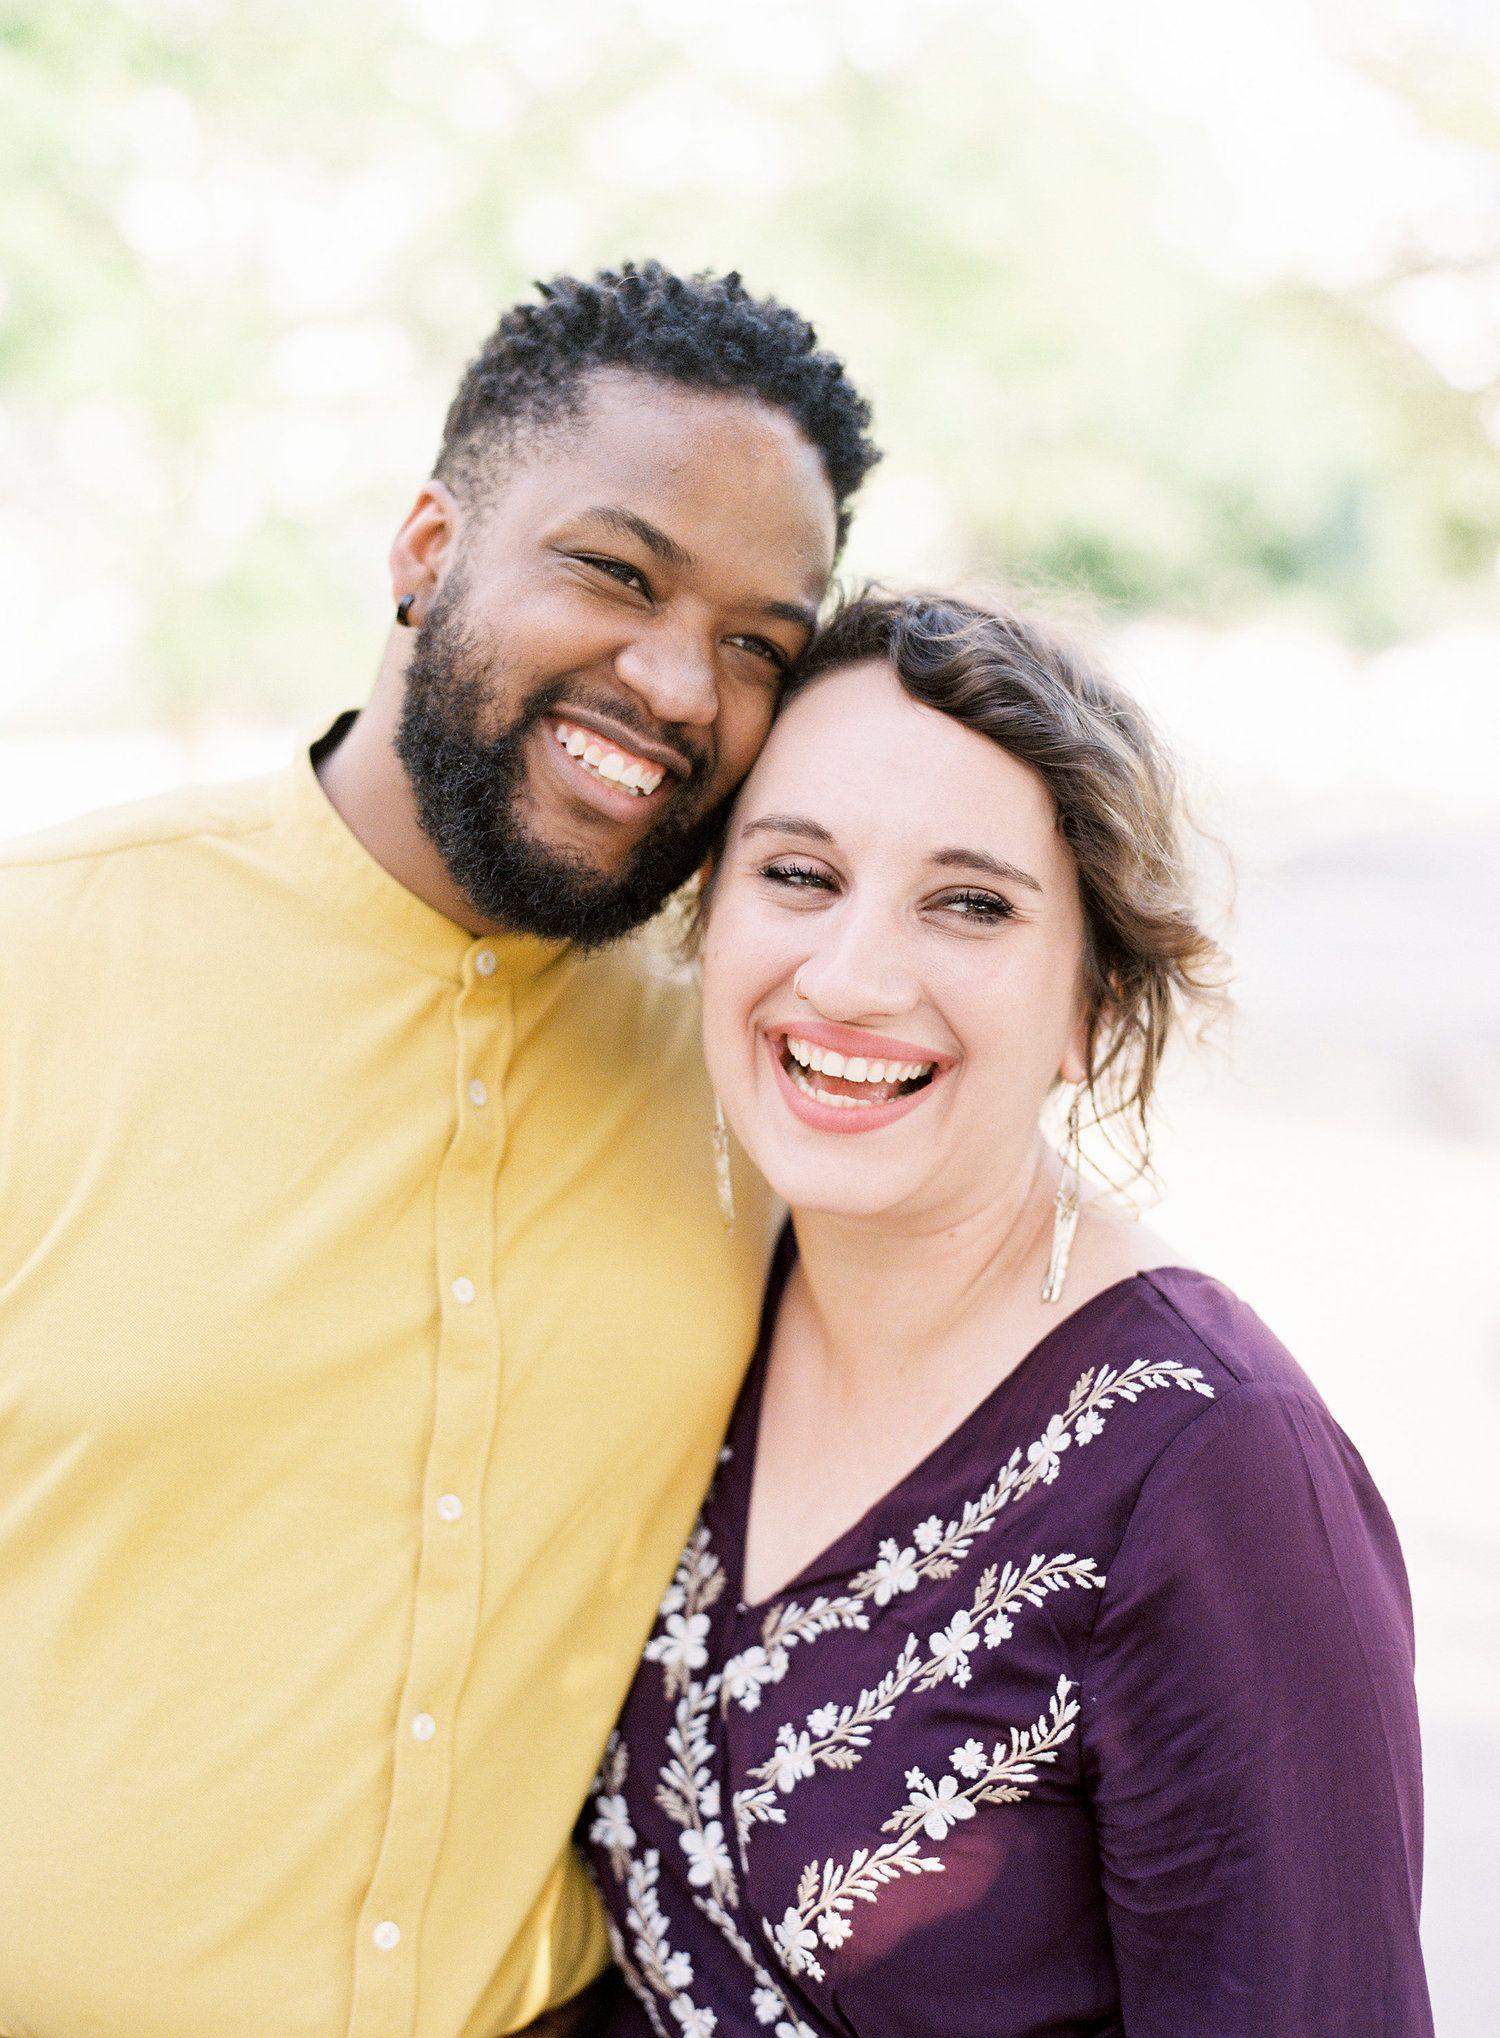 Interracial dating Columbus Ohio bønder bare online dating kommersielle